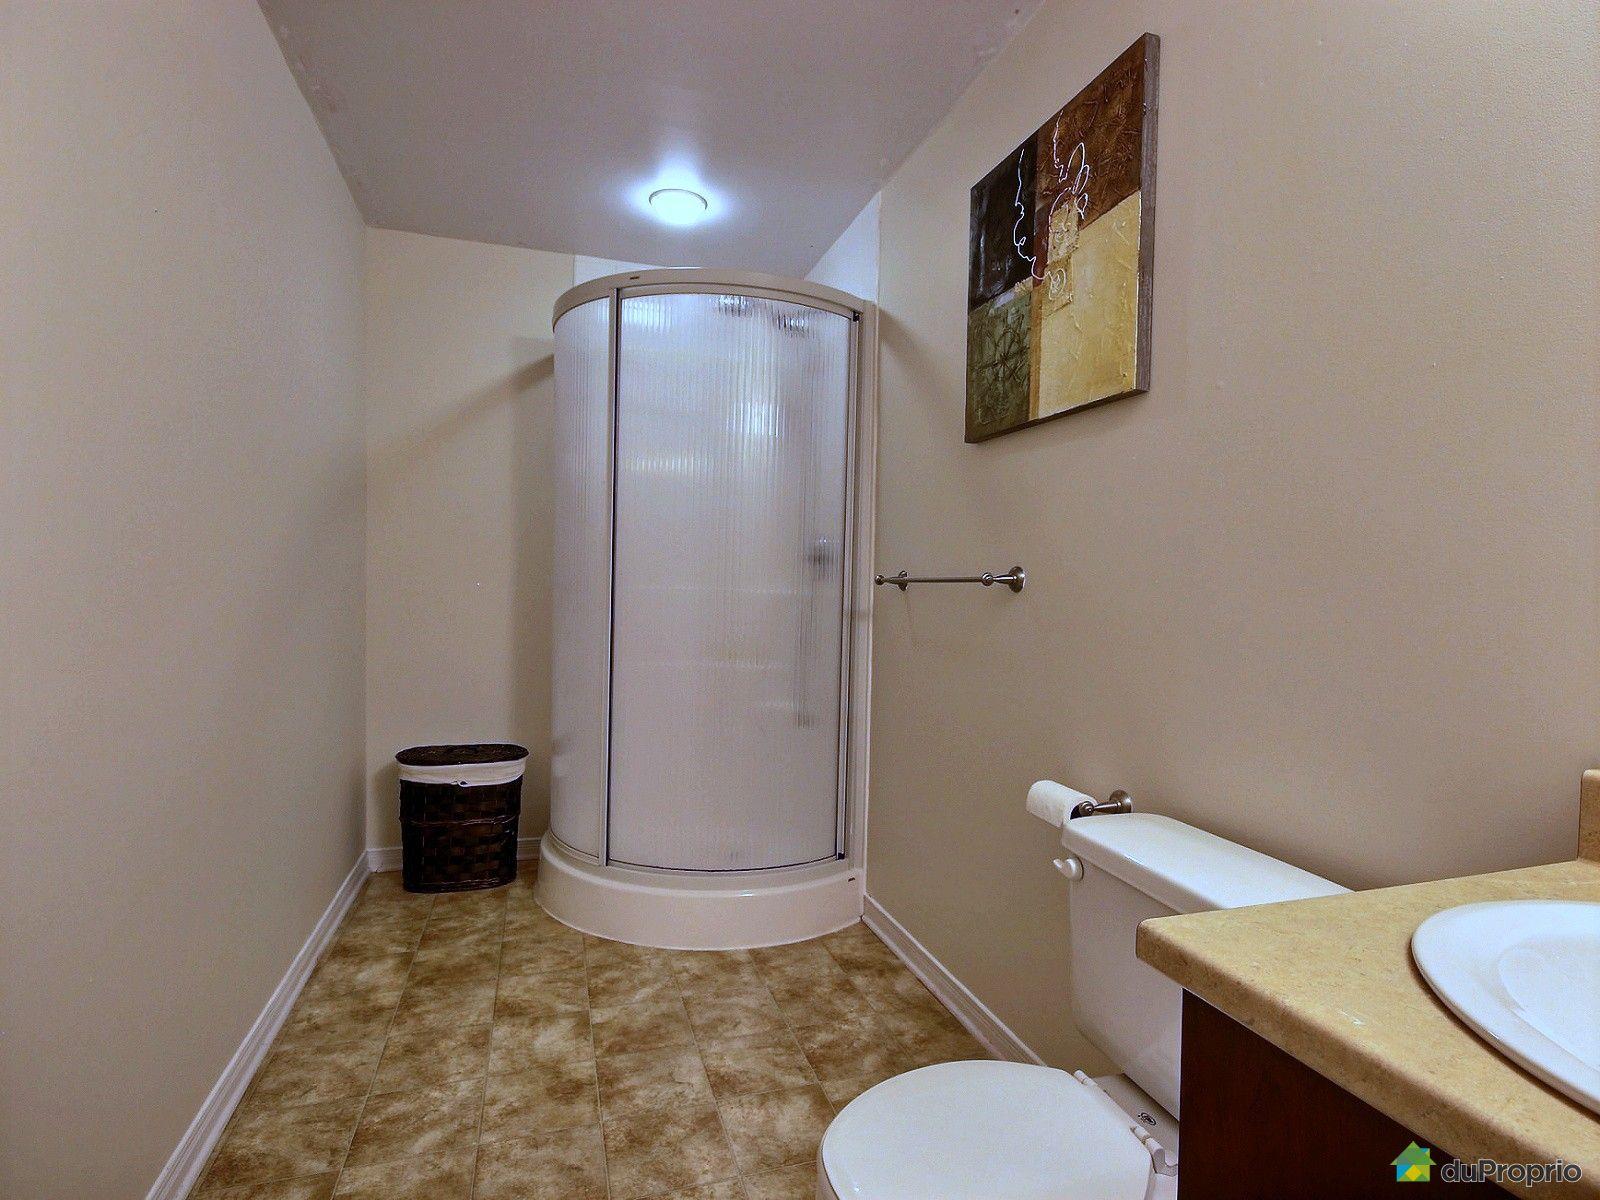 Jumel vendu aylmer immobilier qu bec duproprio 244183 for Salle de bain quebec